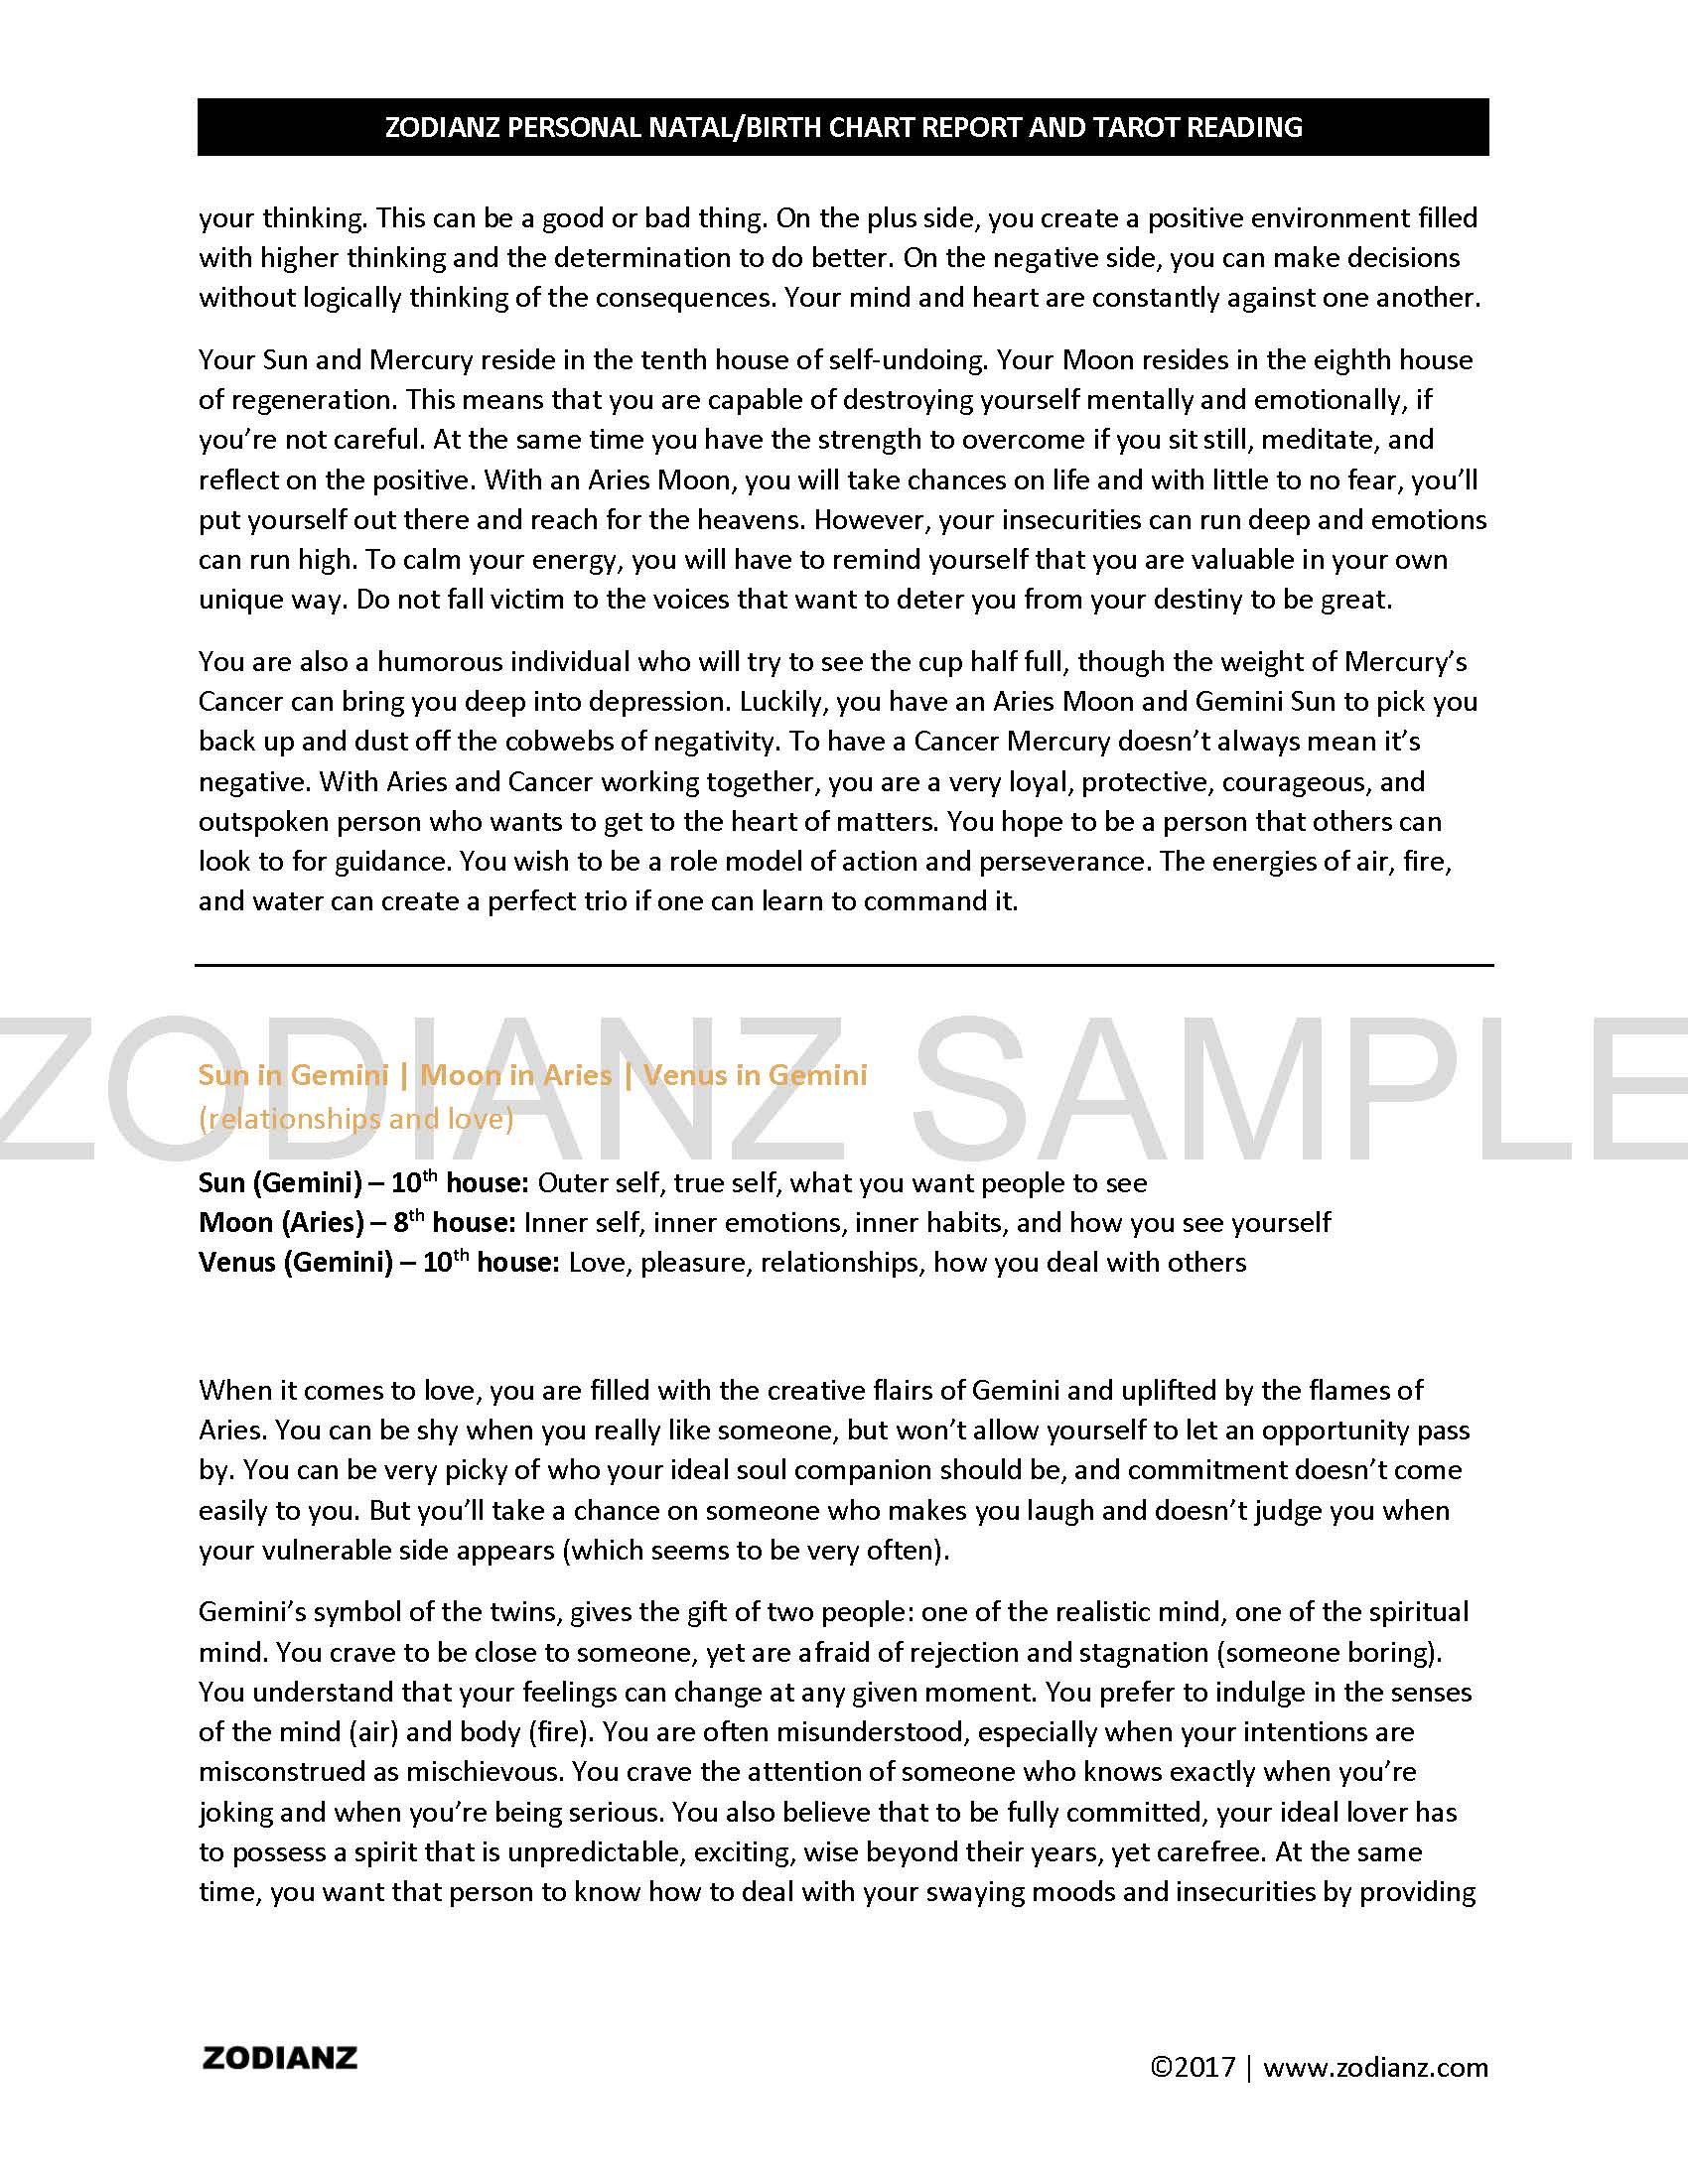 Zodianz Chart Sample 2017page3 Zodianz